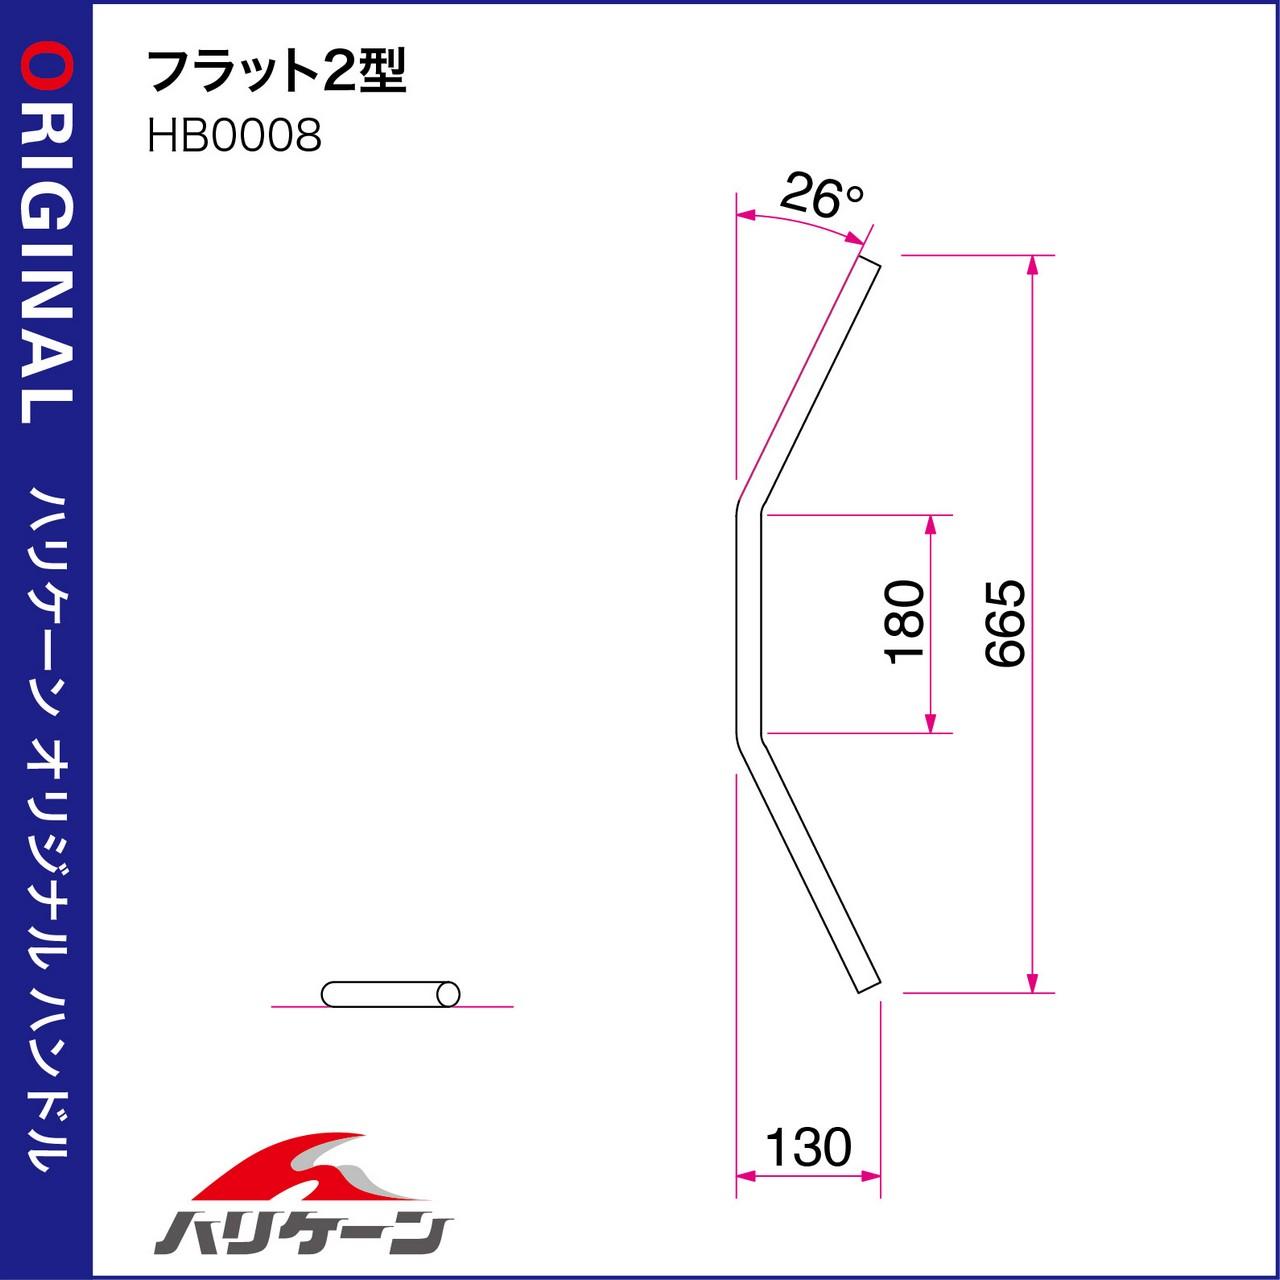 【HURRICANE】Flat Type 2 Φ 7/8 吋 鋼製把手 - 「Webike-摩托百貨」